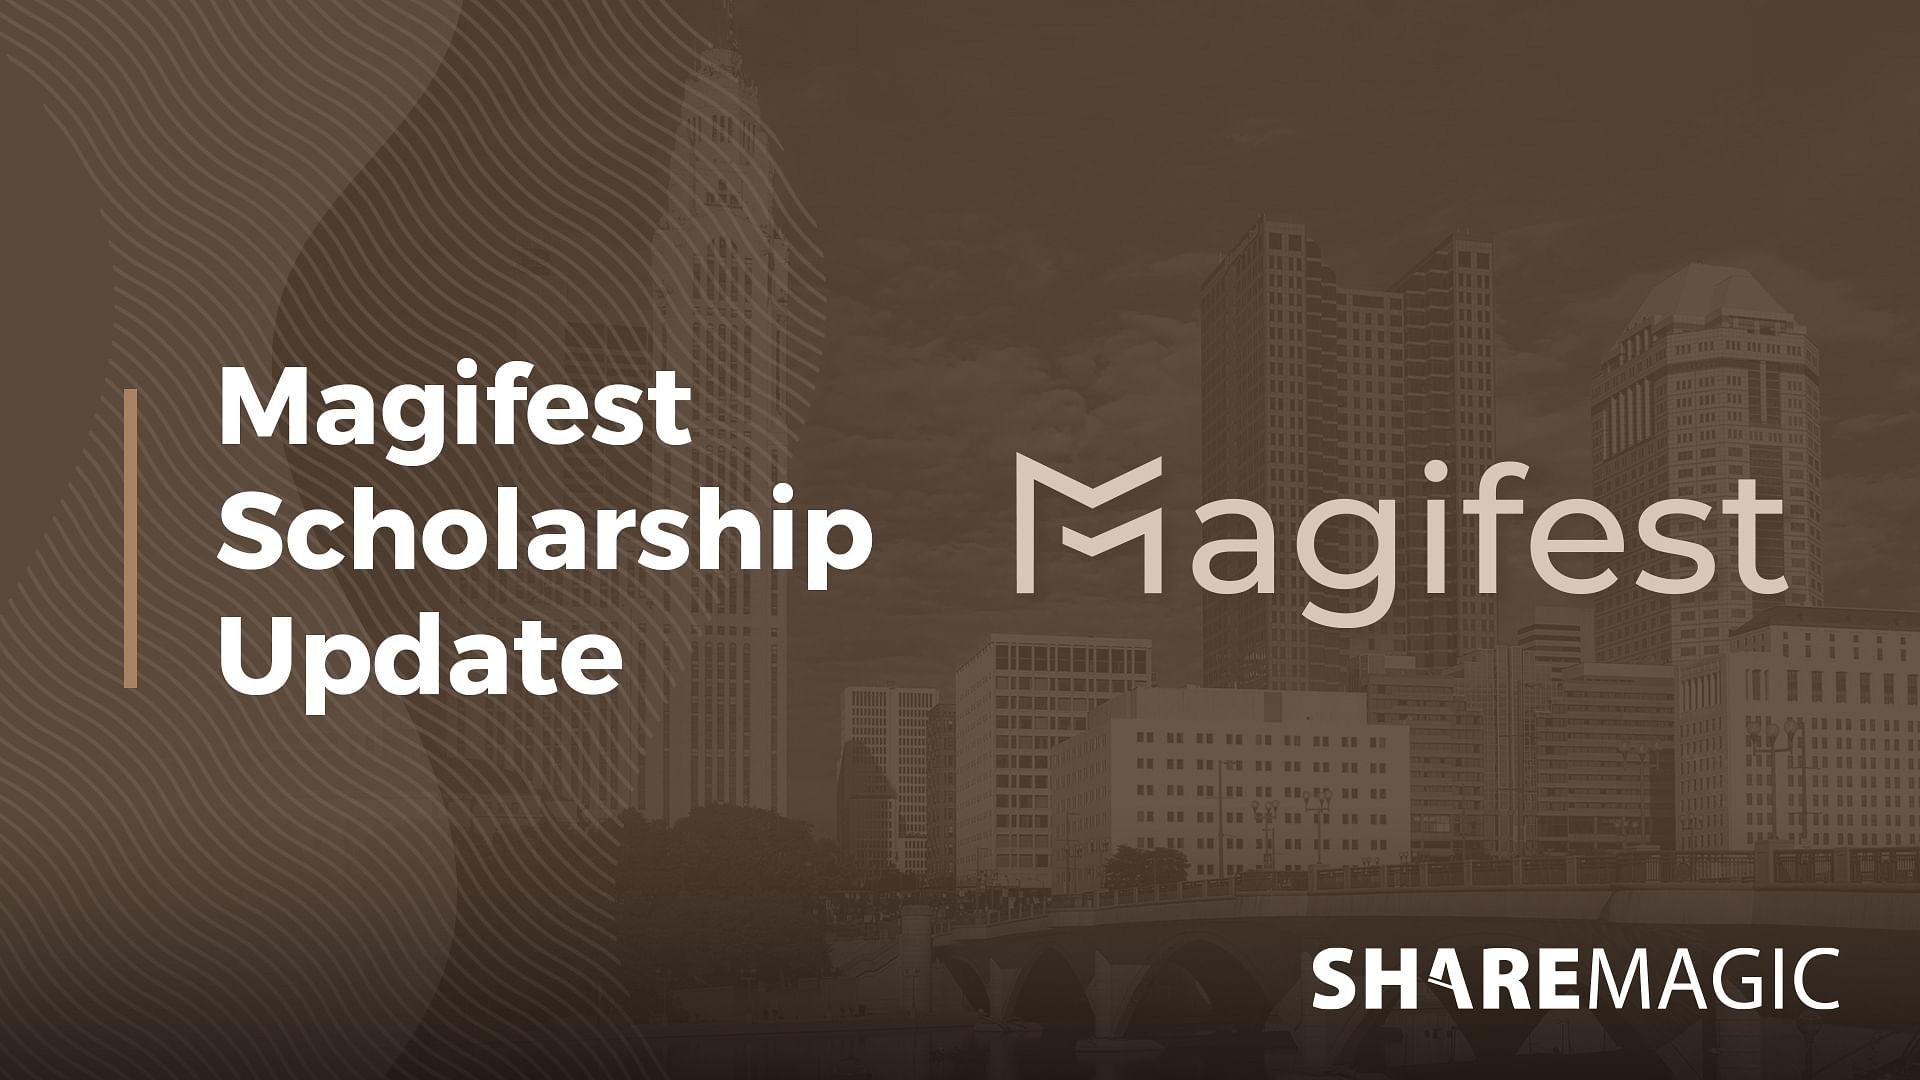 New Magifest Scholarship Update